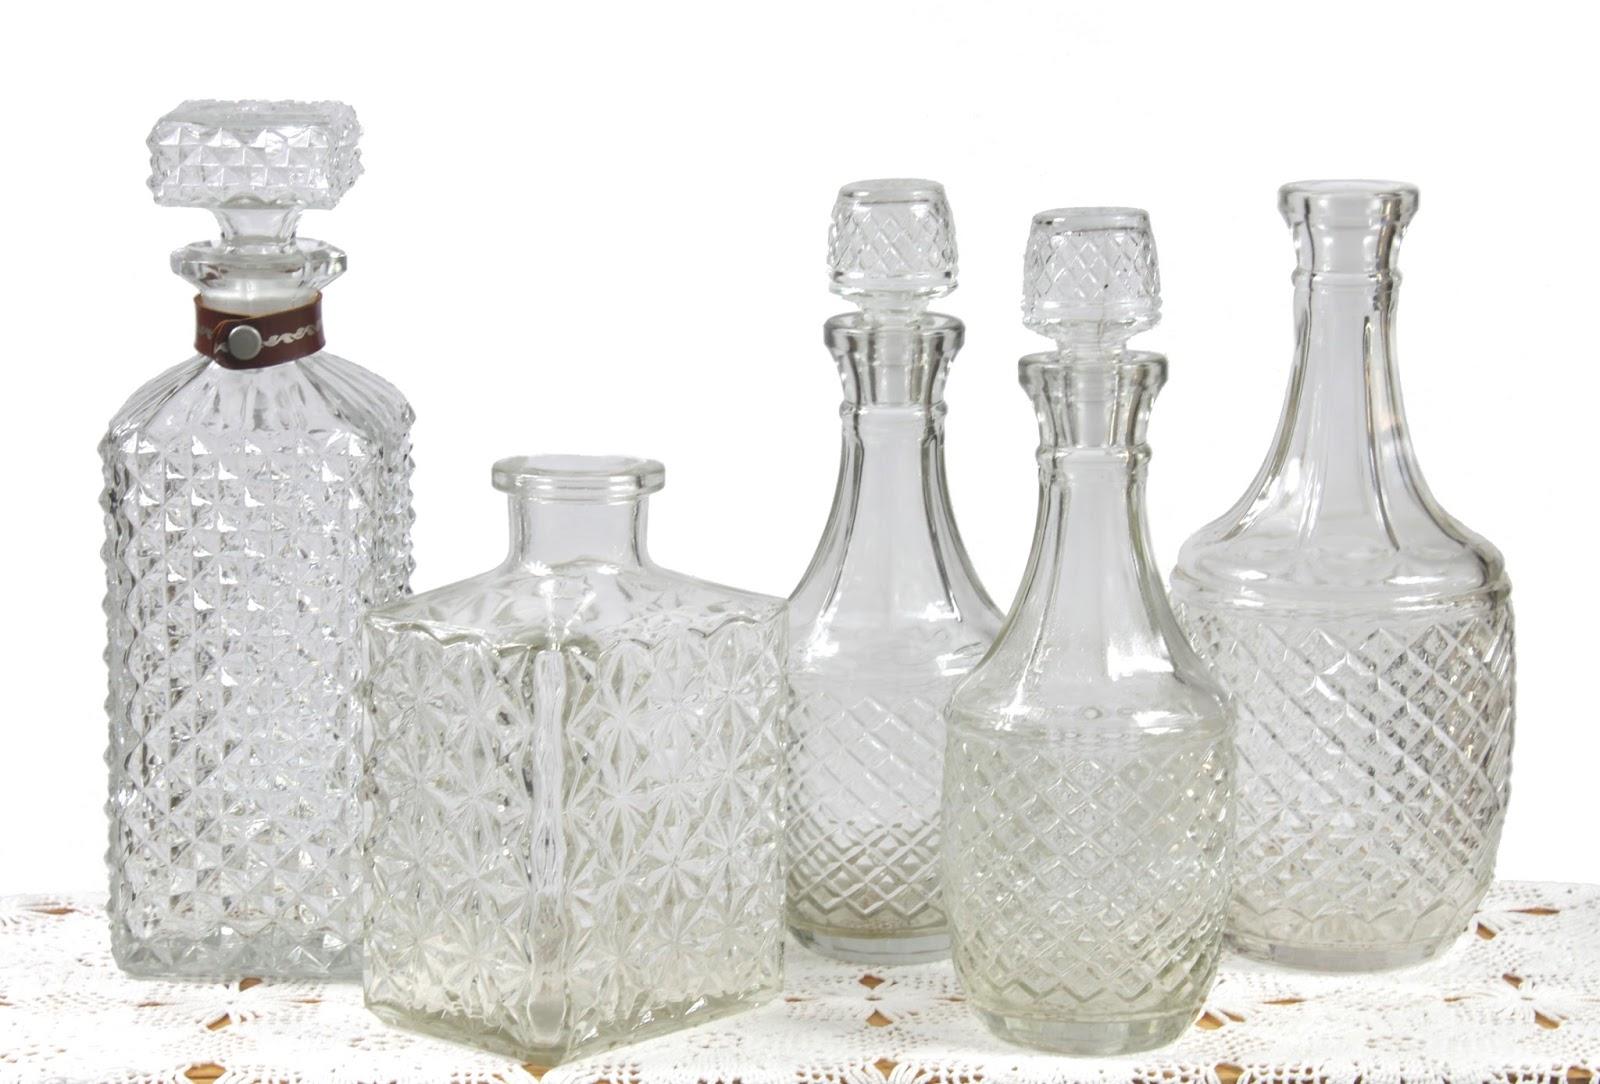 Little vintage days vases bottles and jars for How do i cut glass bottles